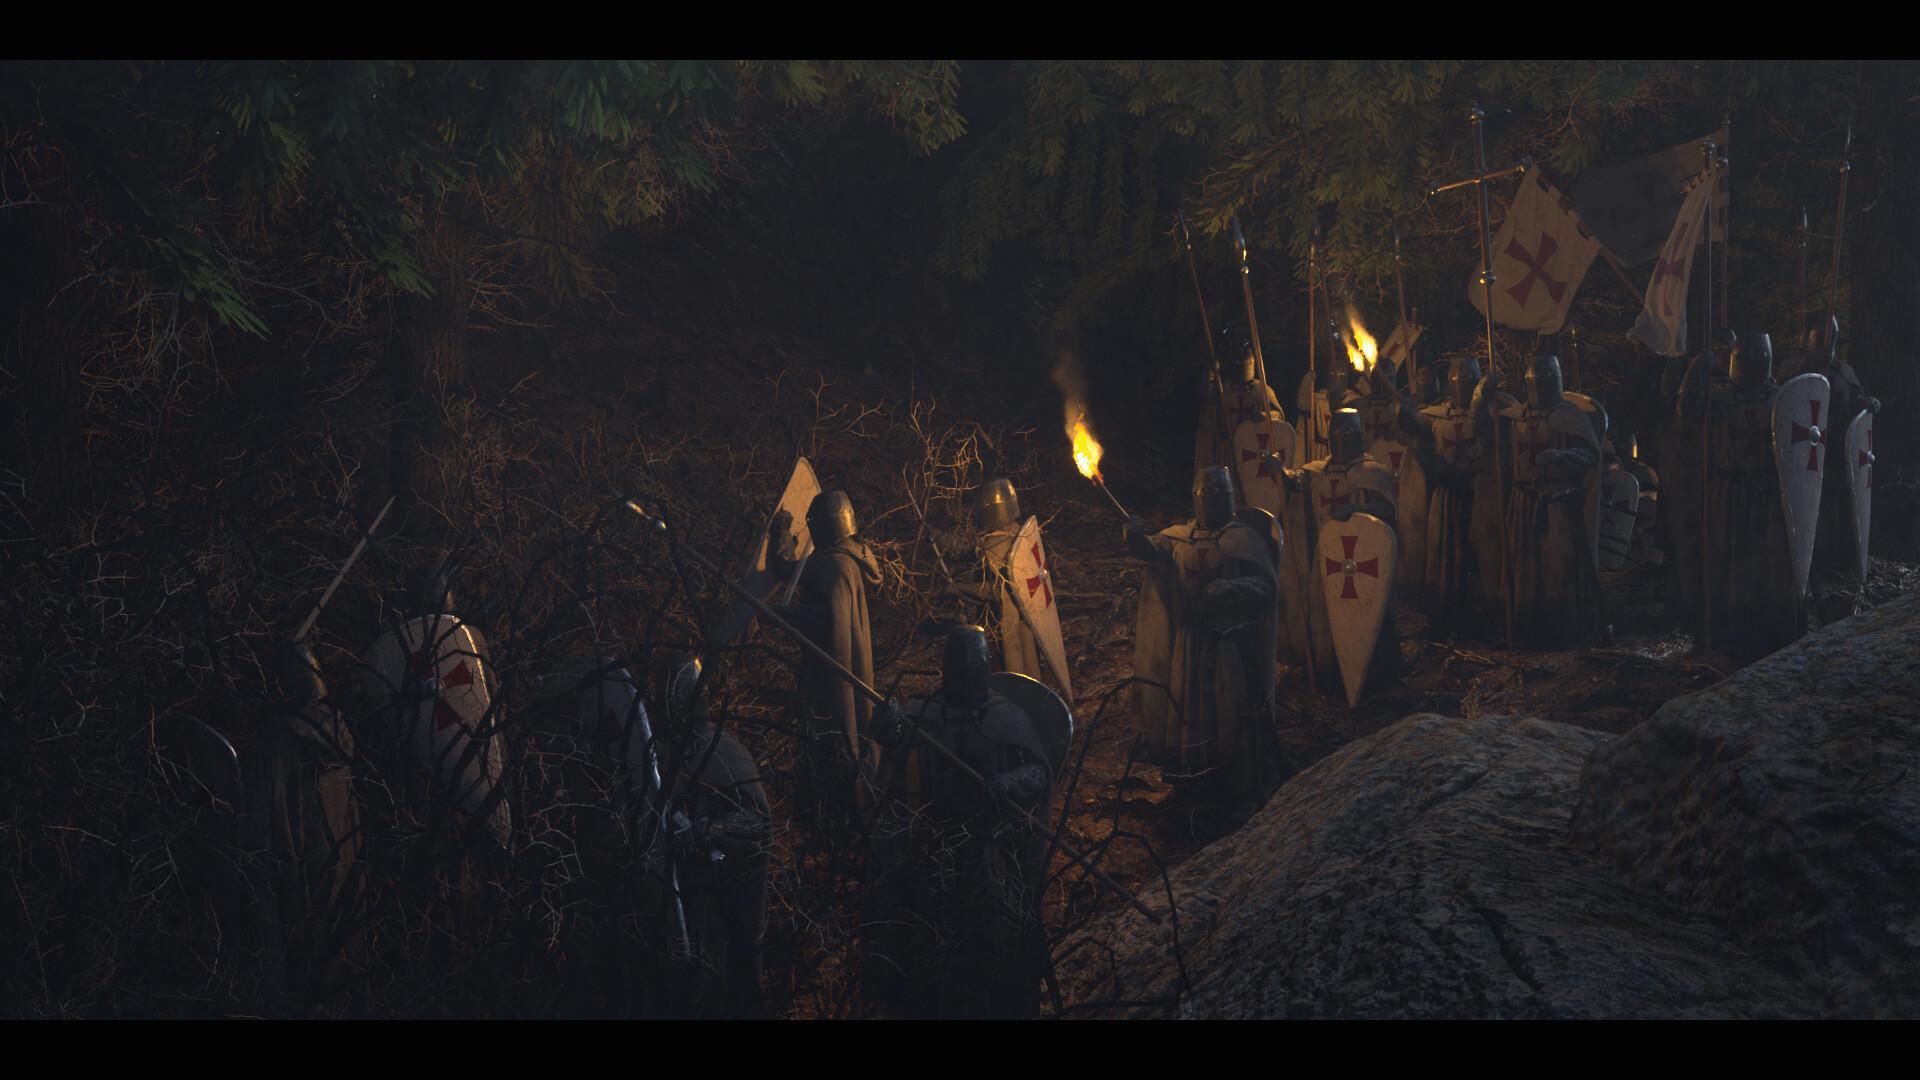 Wojtek kapusta templars forest 04